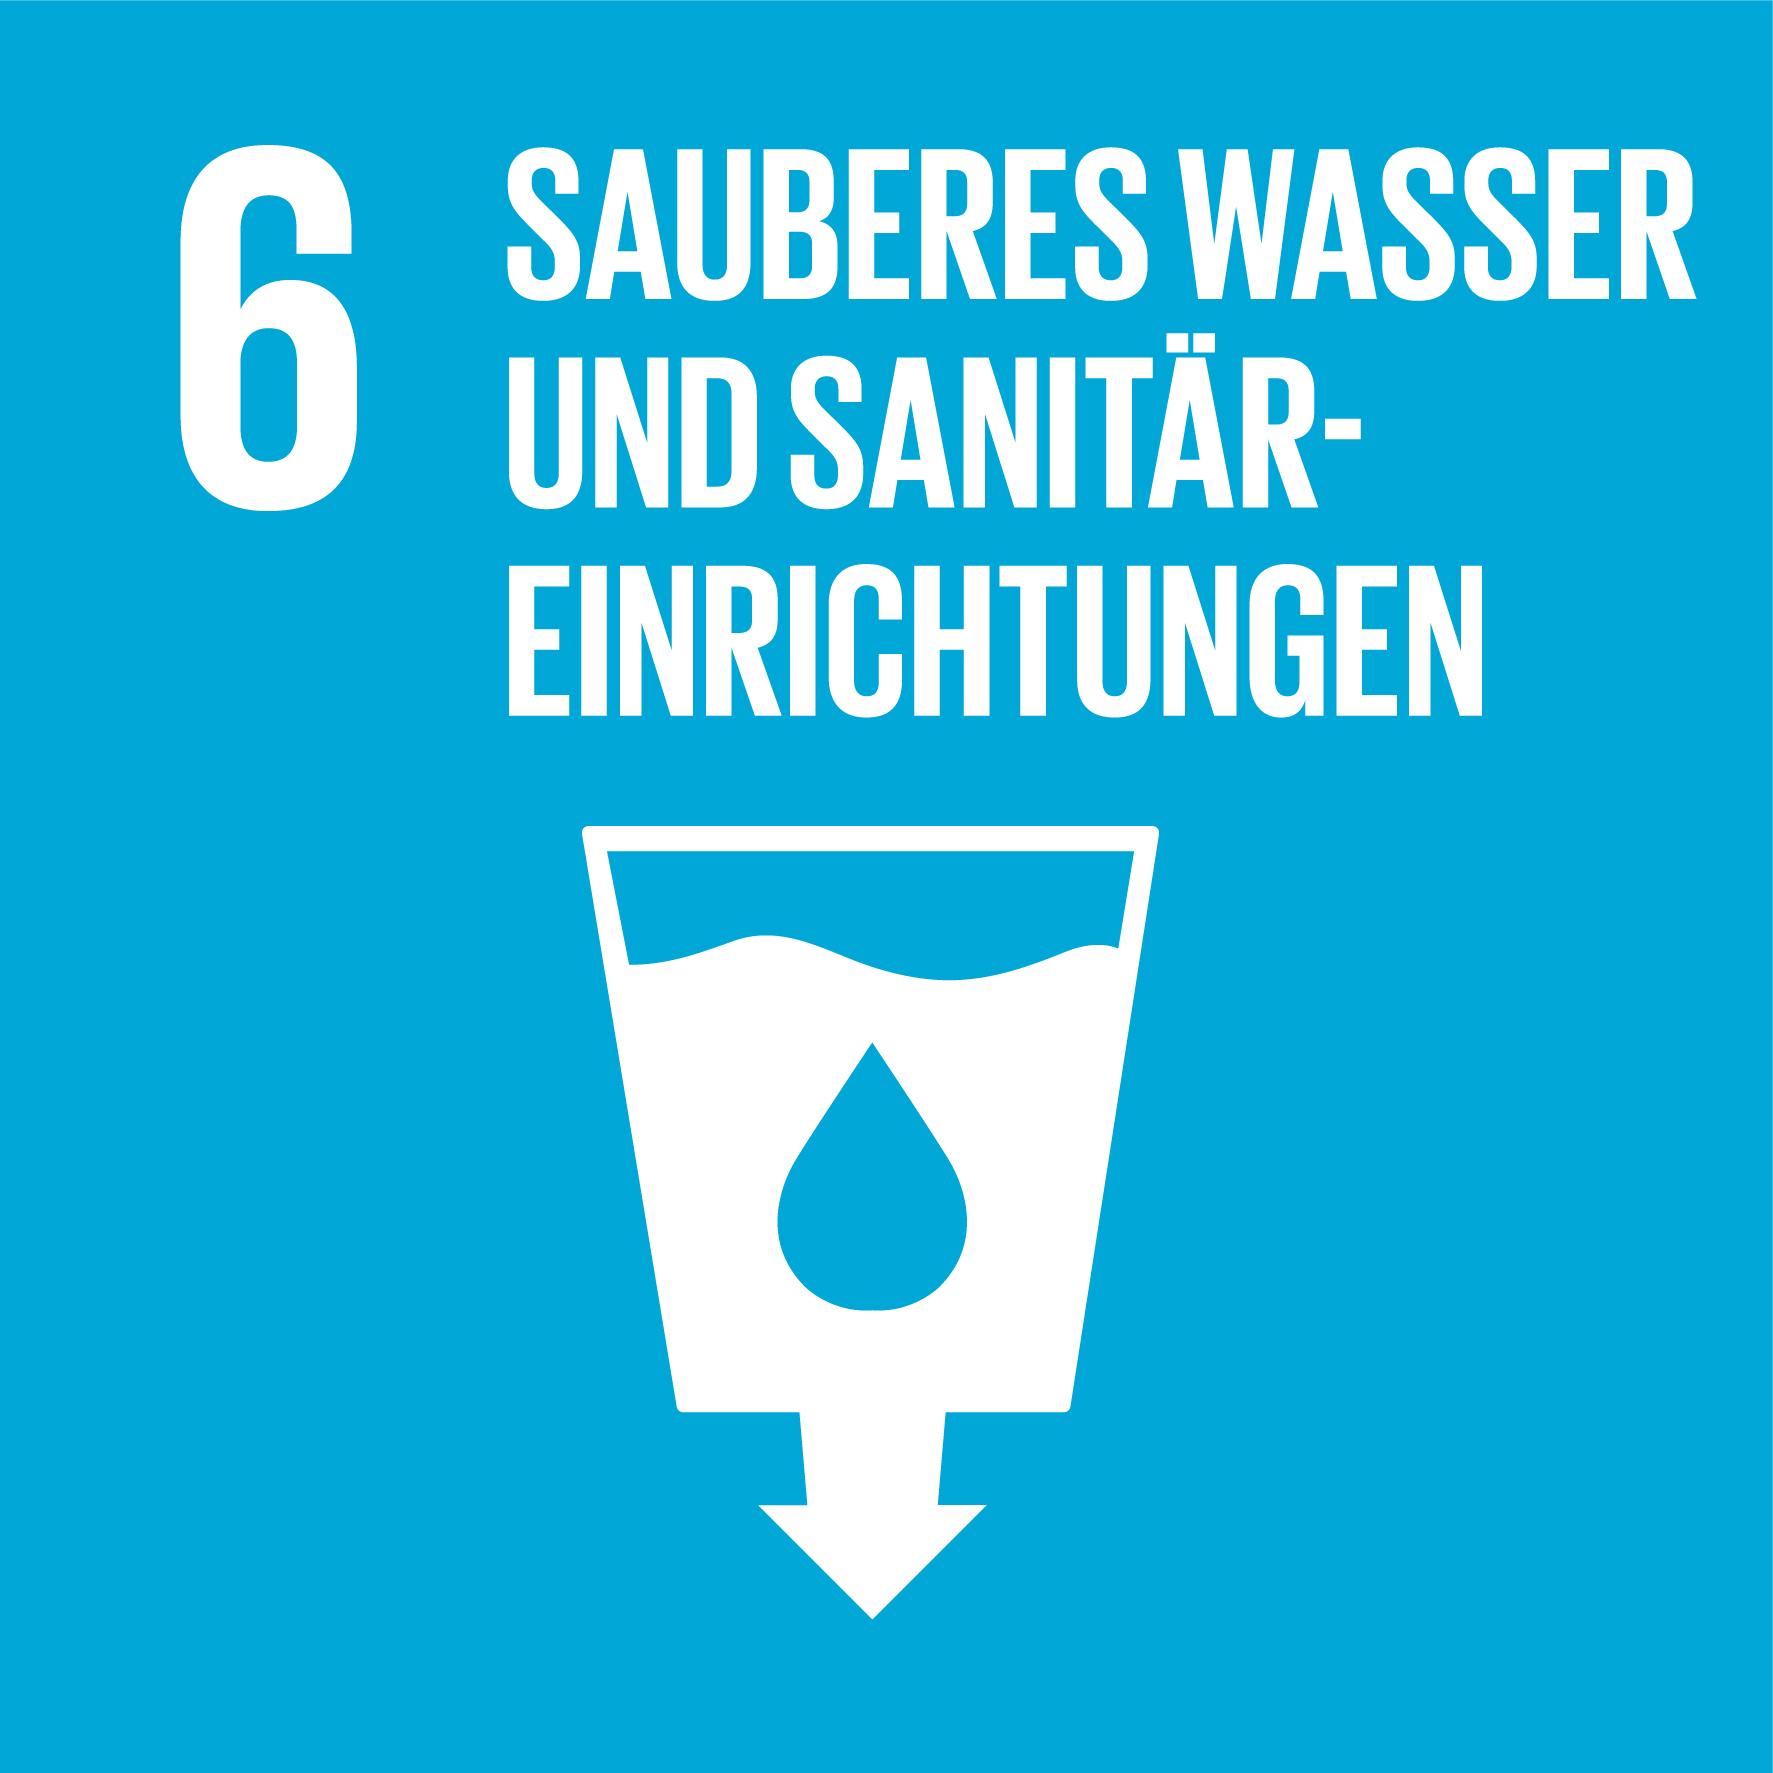 SDG 6 Sauberes Wasser